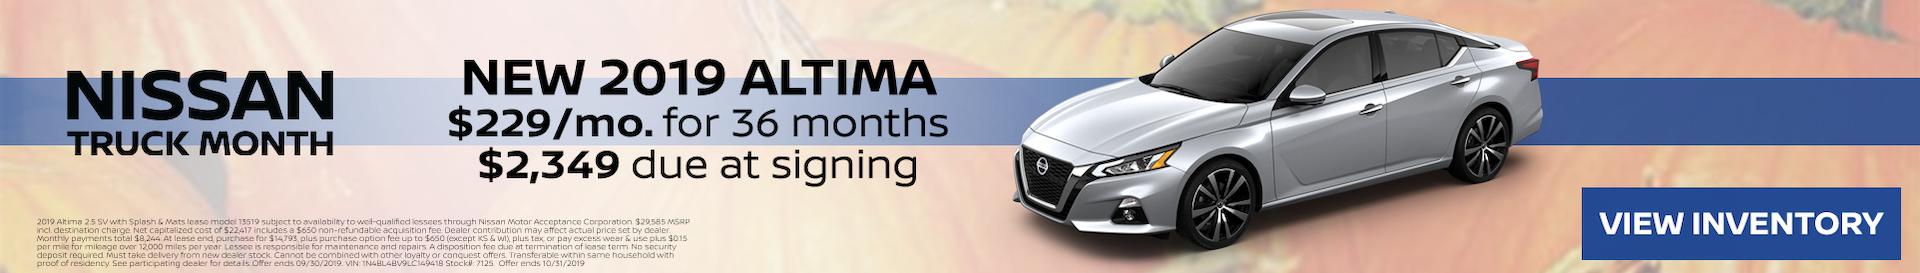 2019 Altima October Special Offer